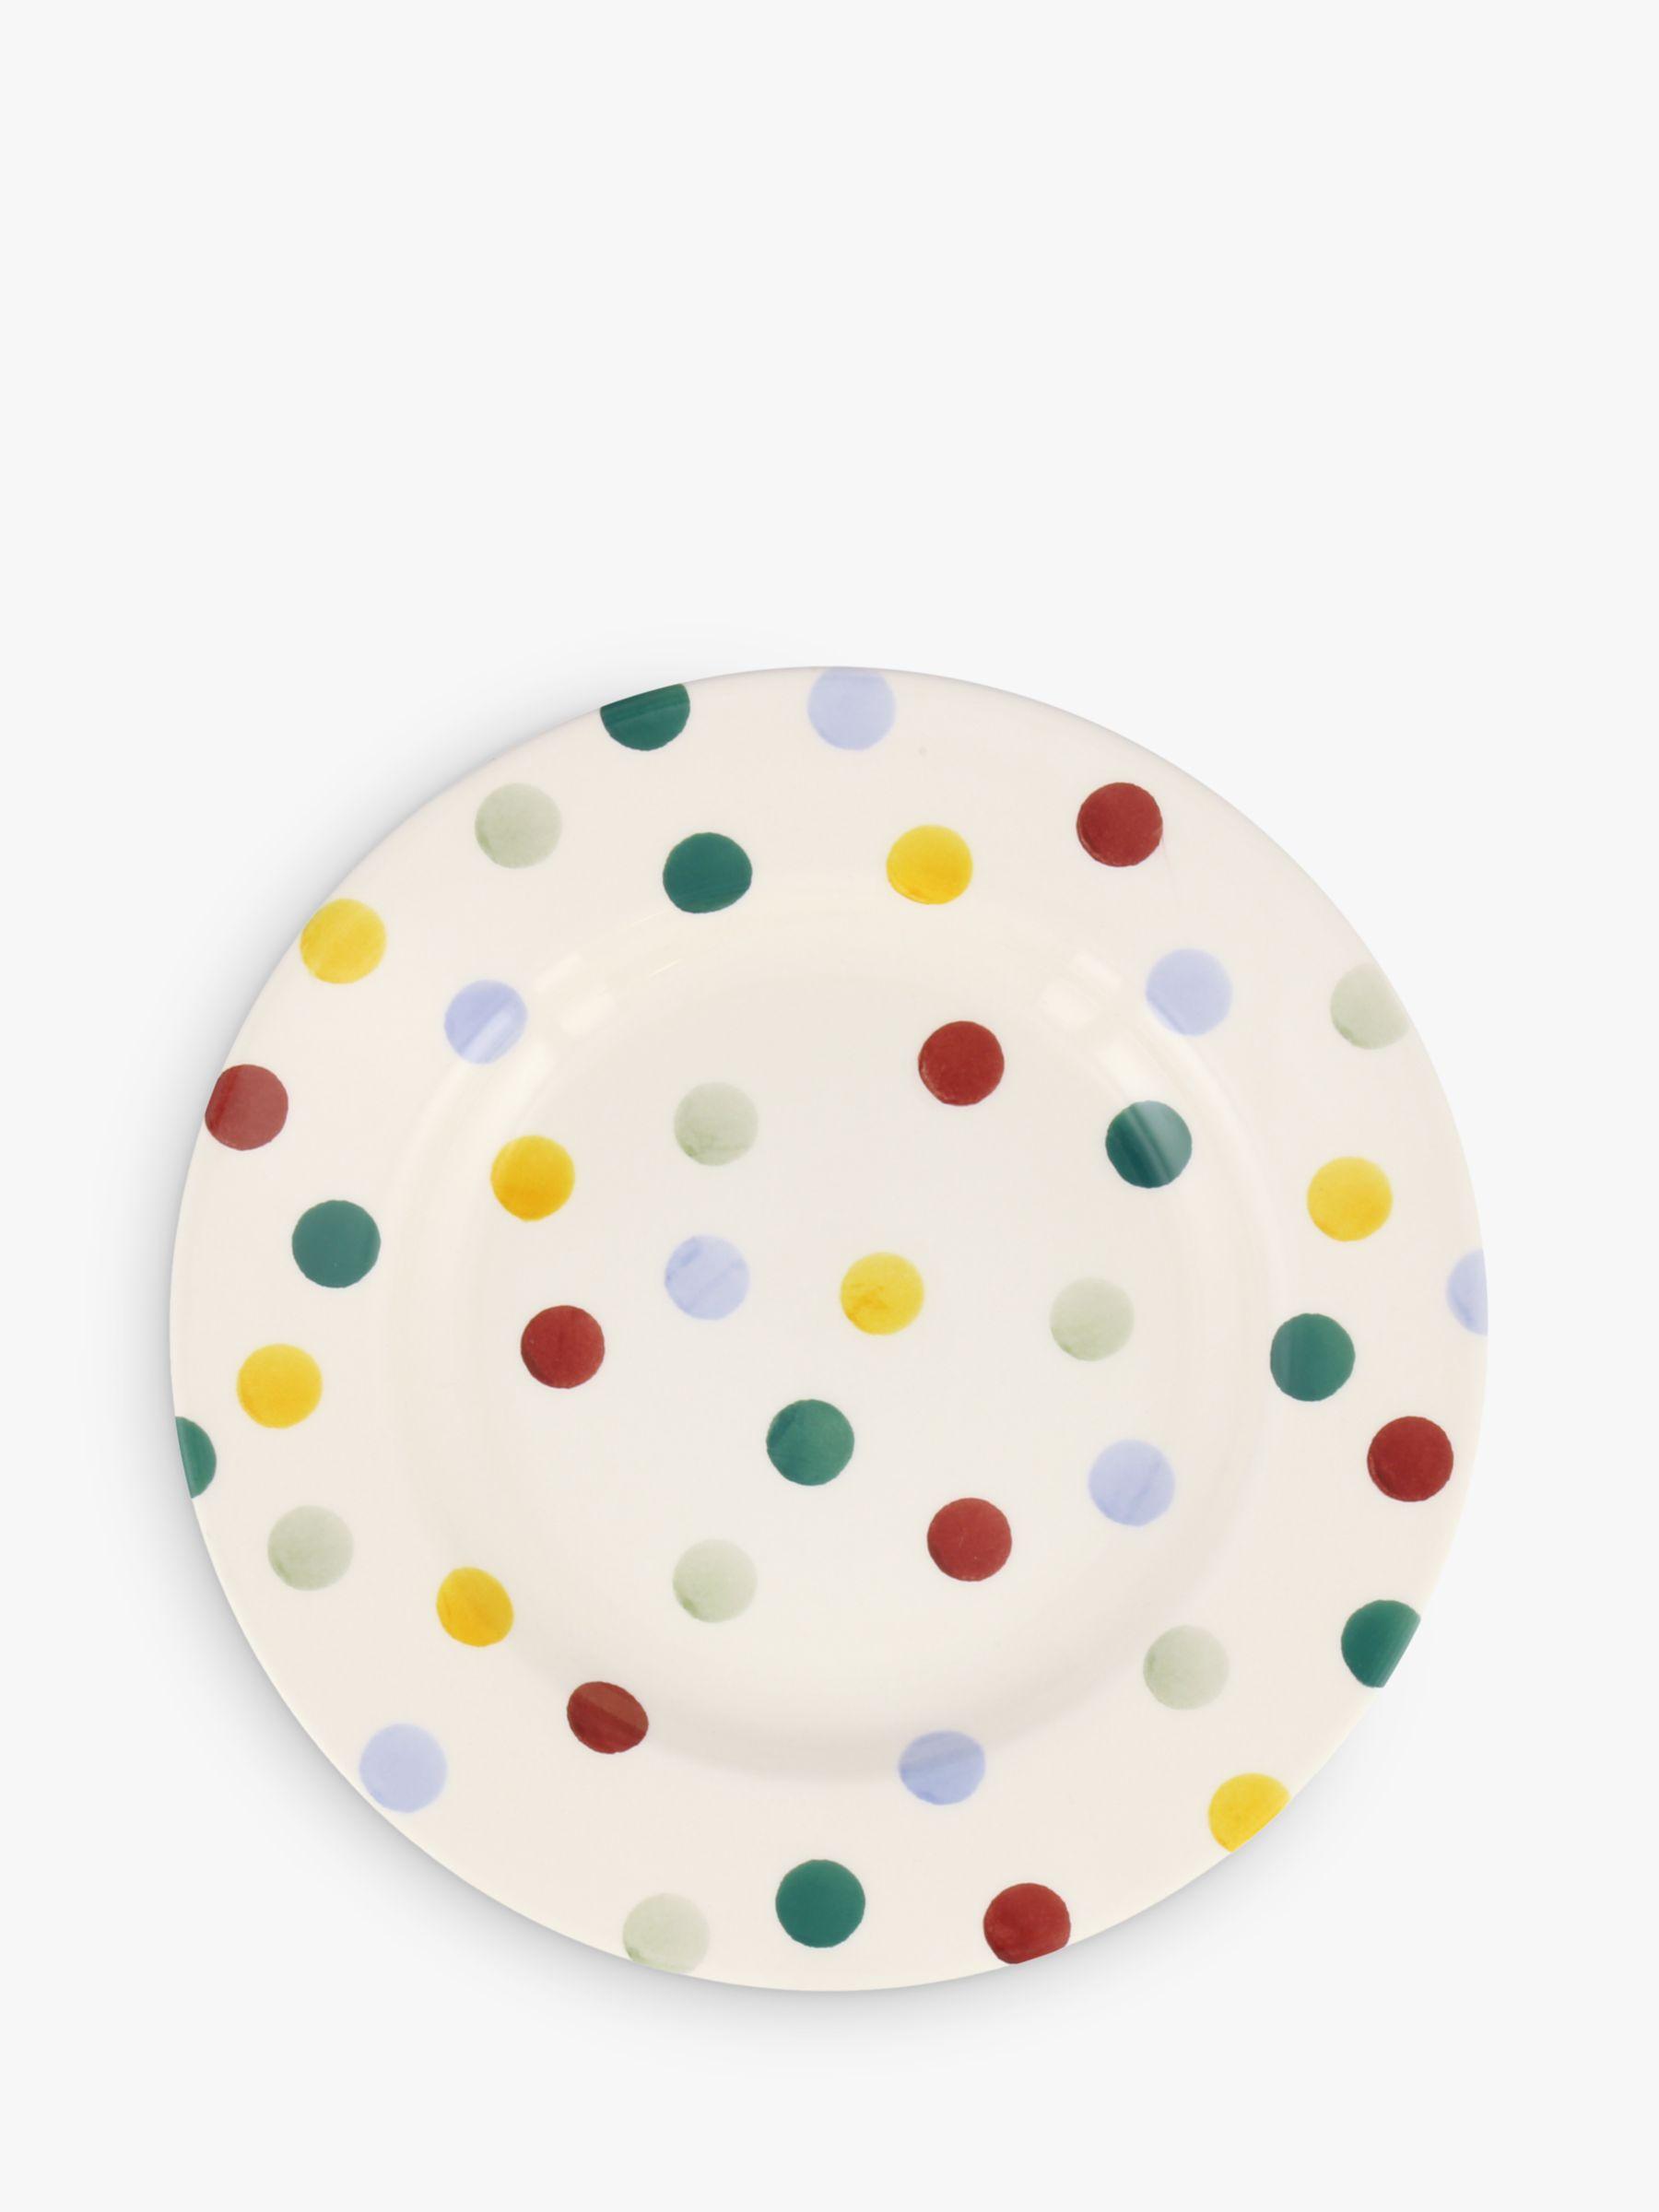 Emma Bridgewater Emma Bridgewater Polka Dot Plate, Multi, Dia.21.5cm